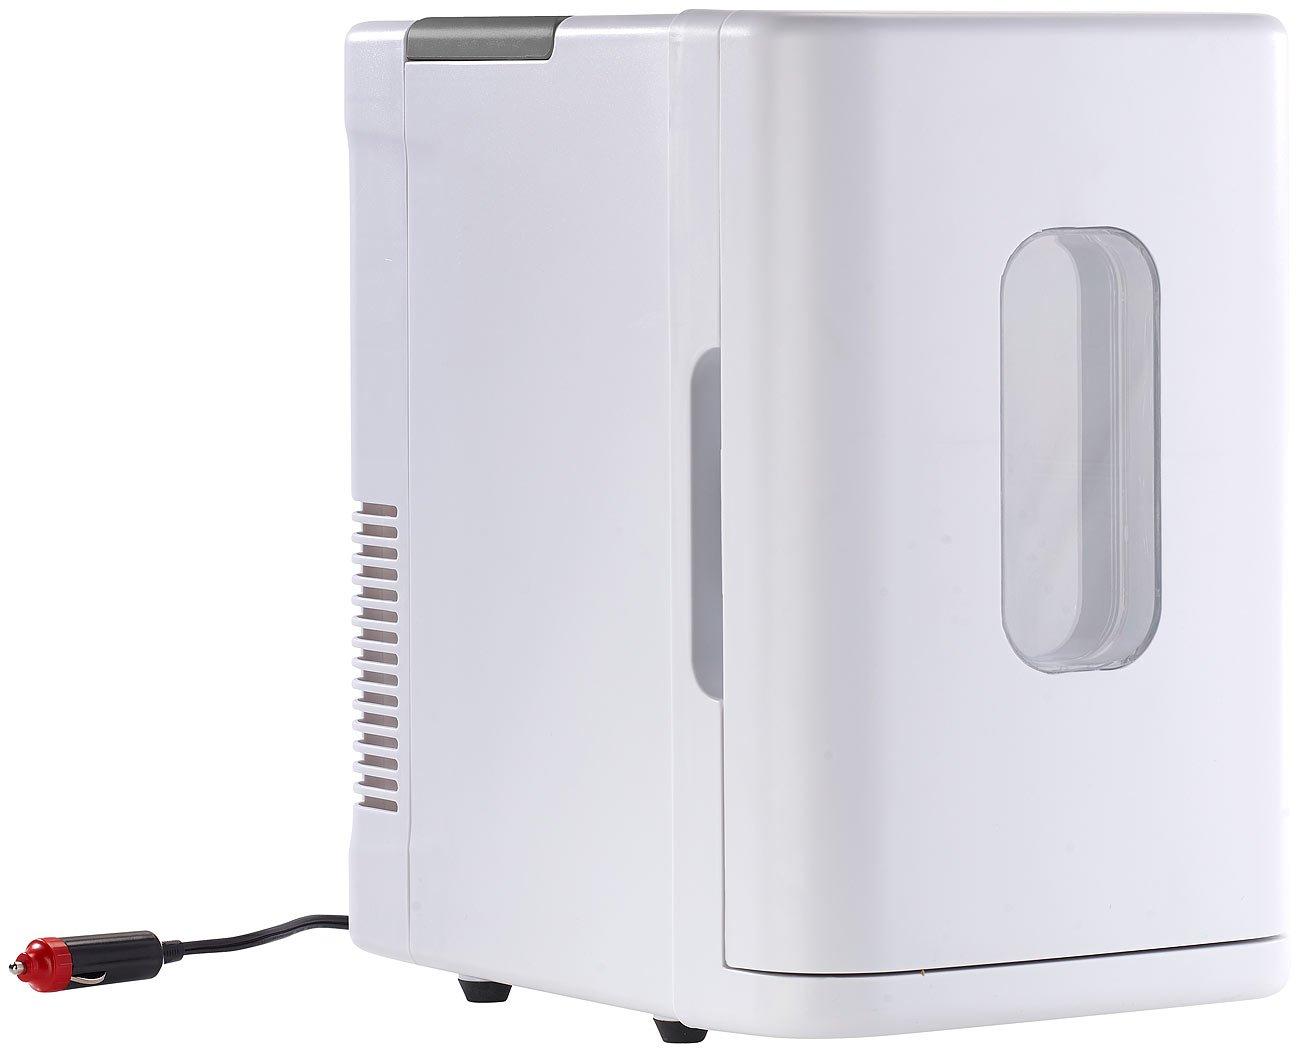 Mini Kühlschrank Zigarettenanzünder : Silvercrest mini kühlschrank von lidl ansehen discounto